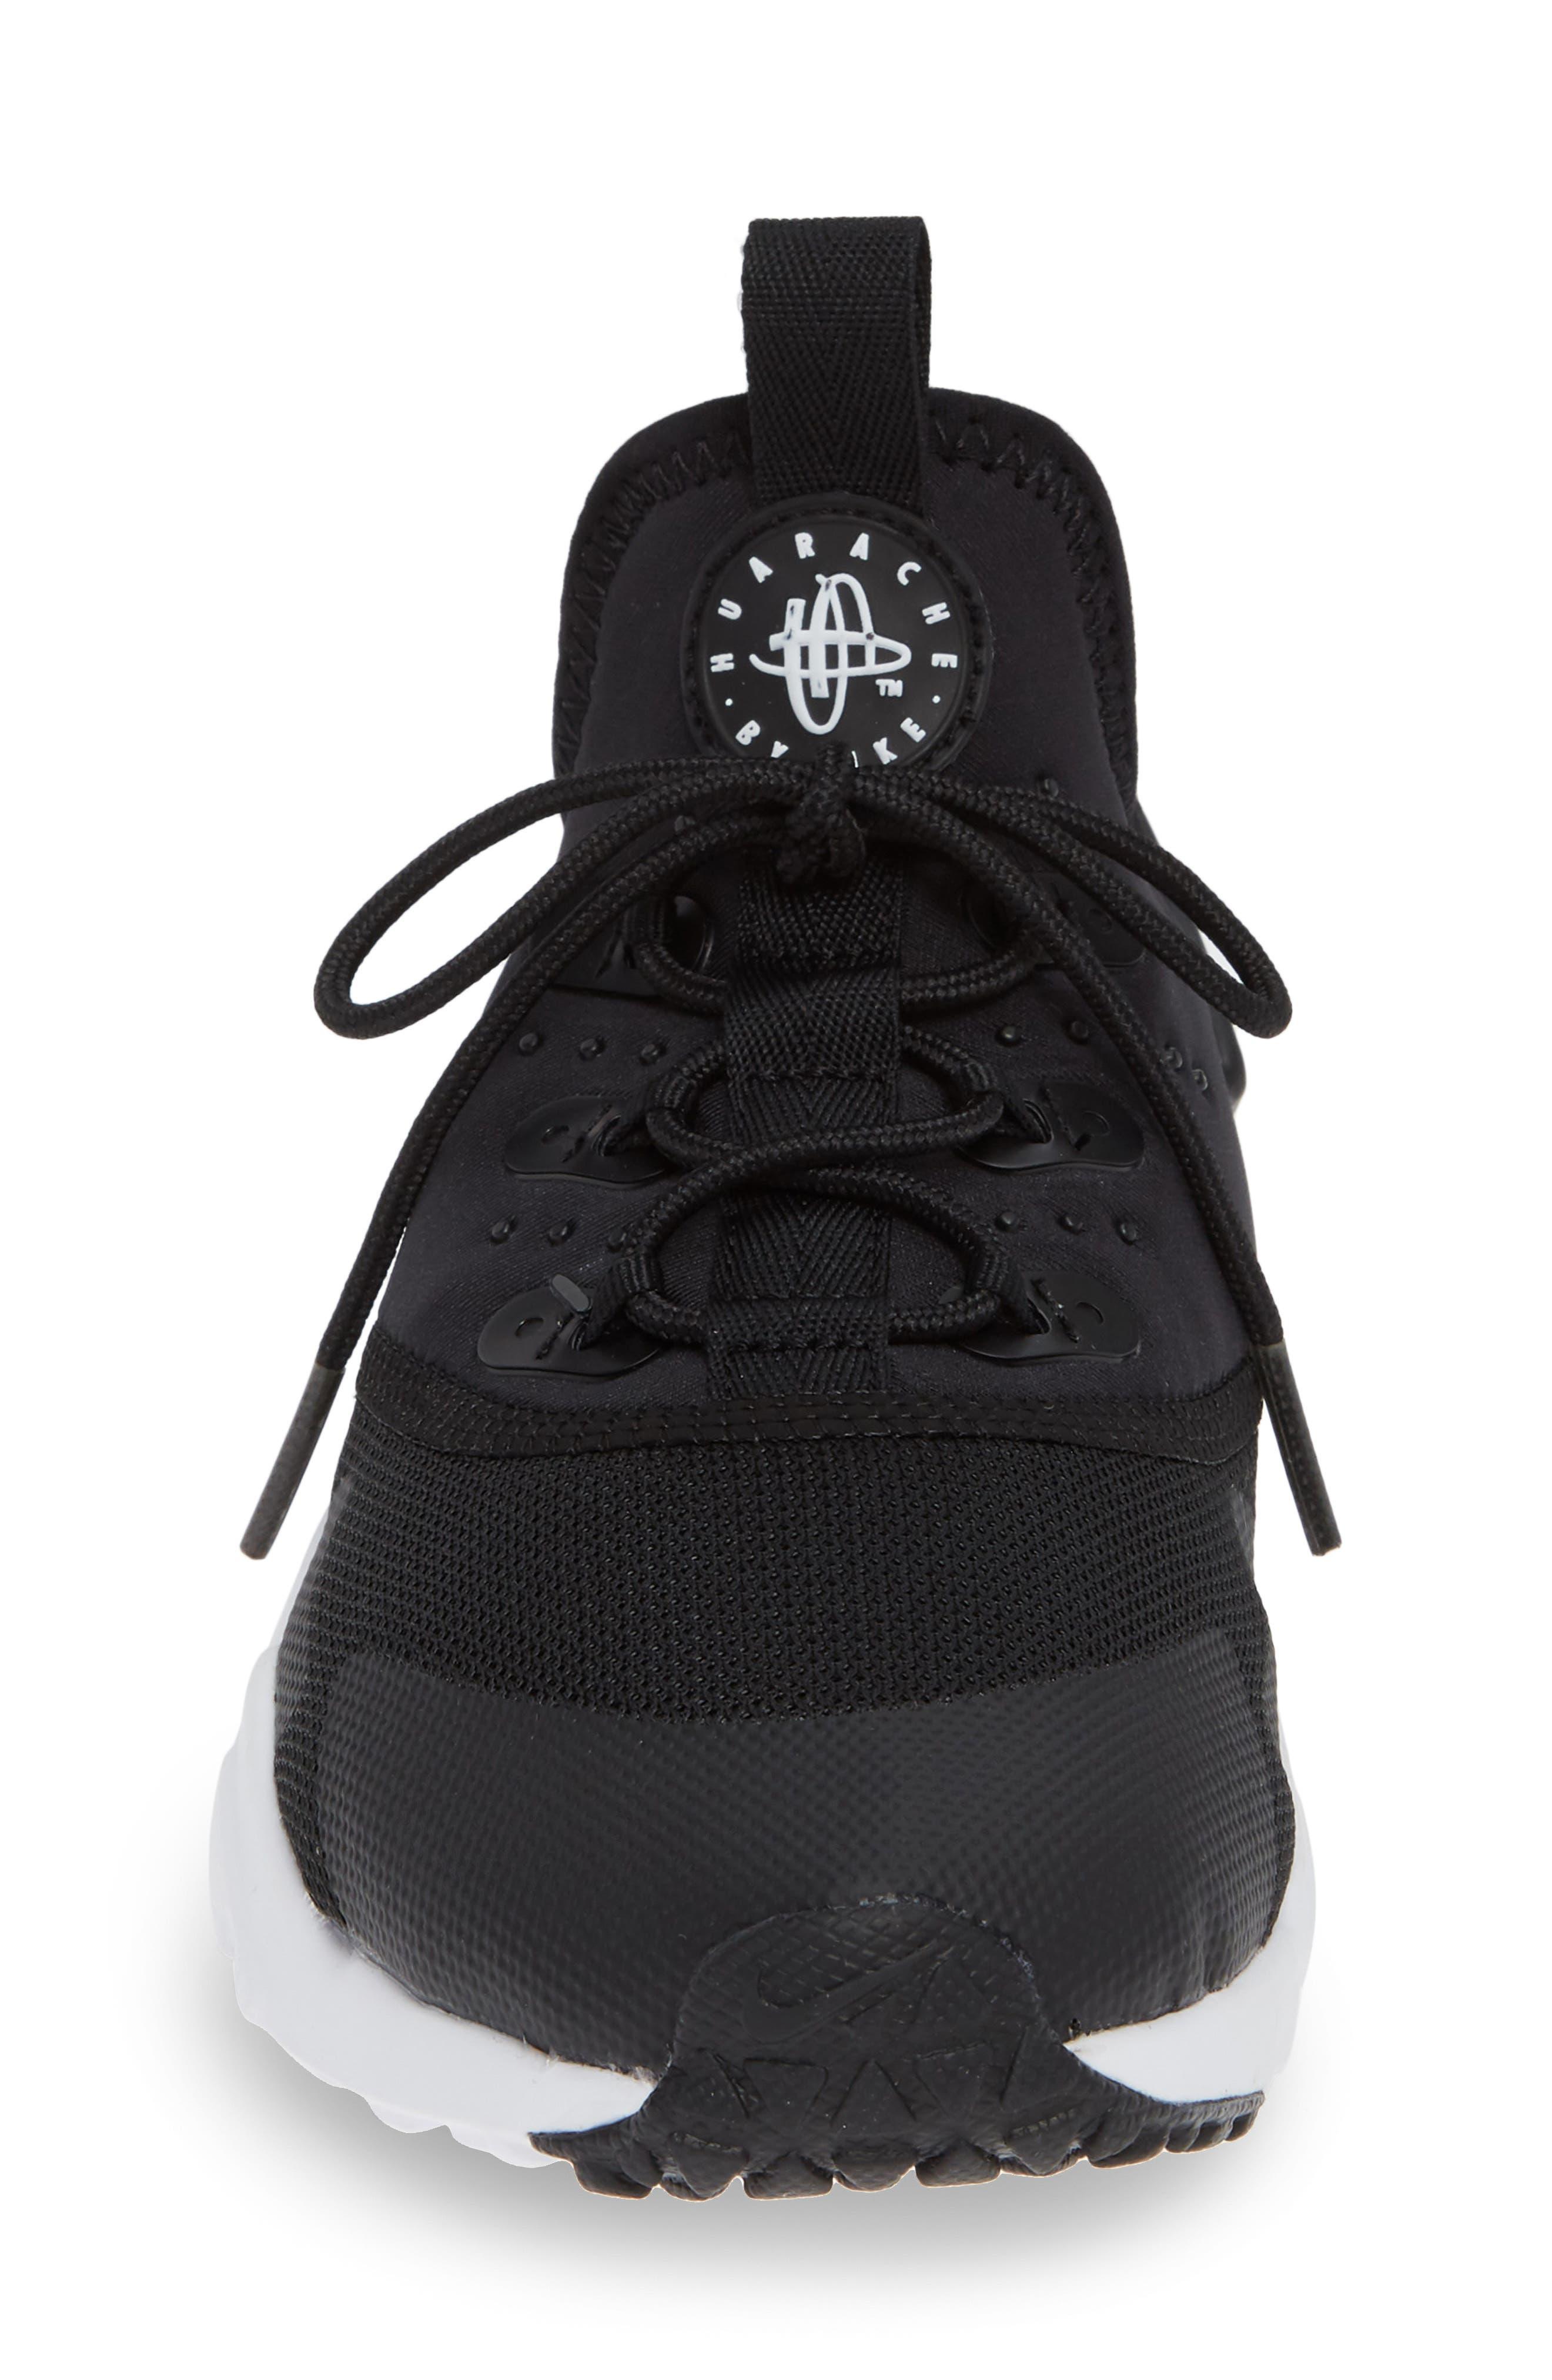 Huarache Run Drift Sneaker,                             Alternate thumbnail 6, color,                             Black/ Anthracite